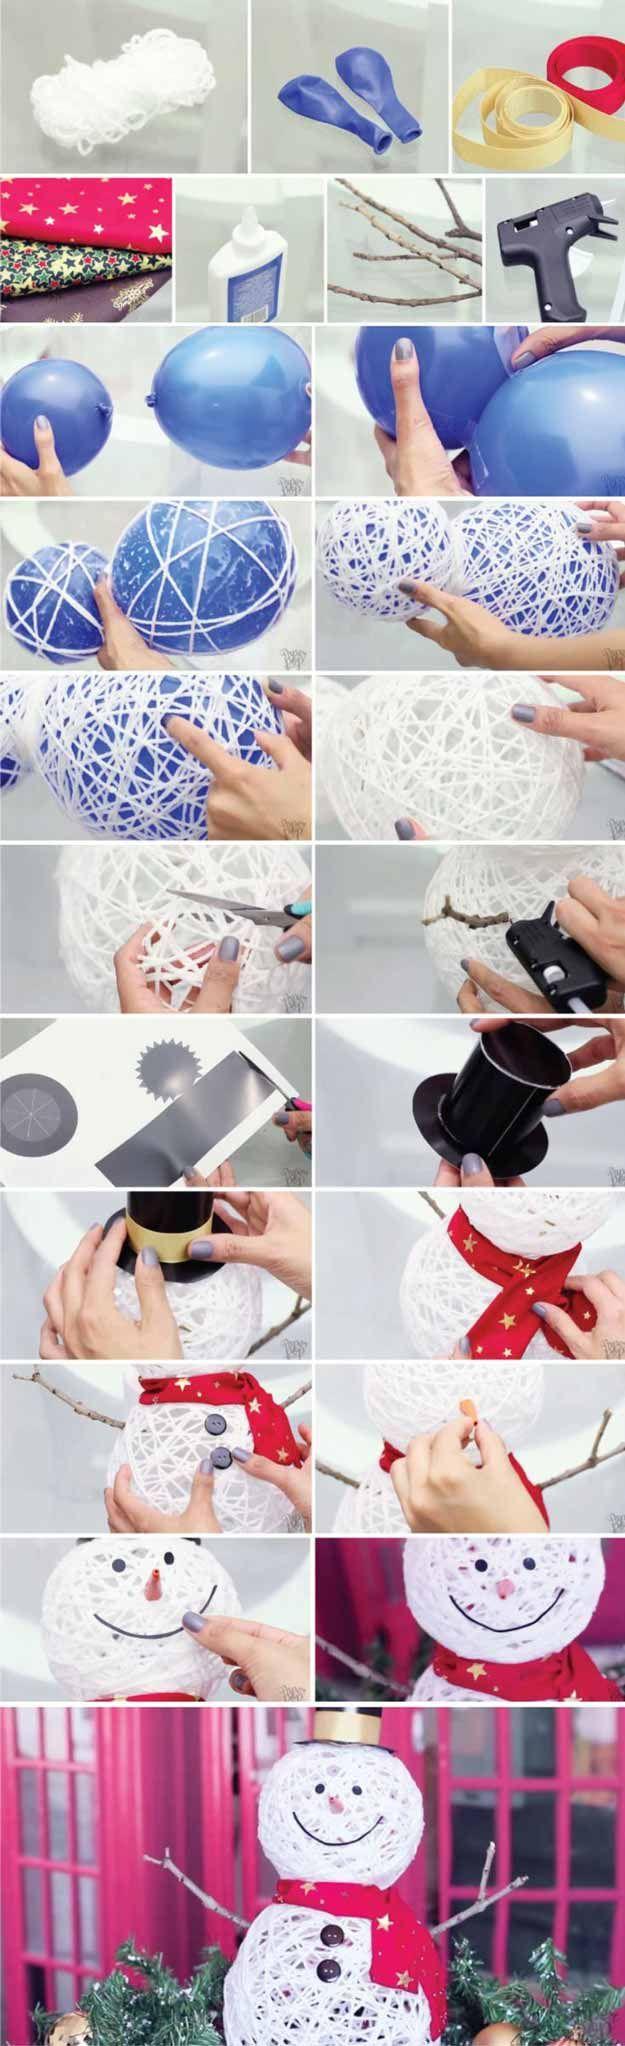 Balloon Crafts